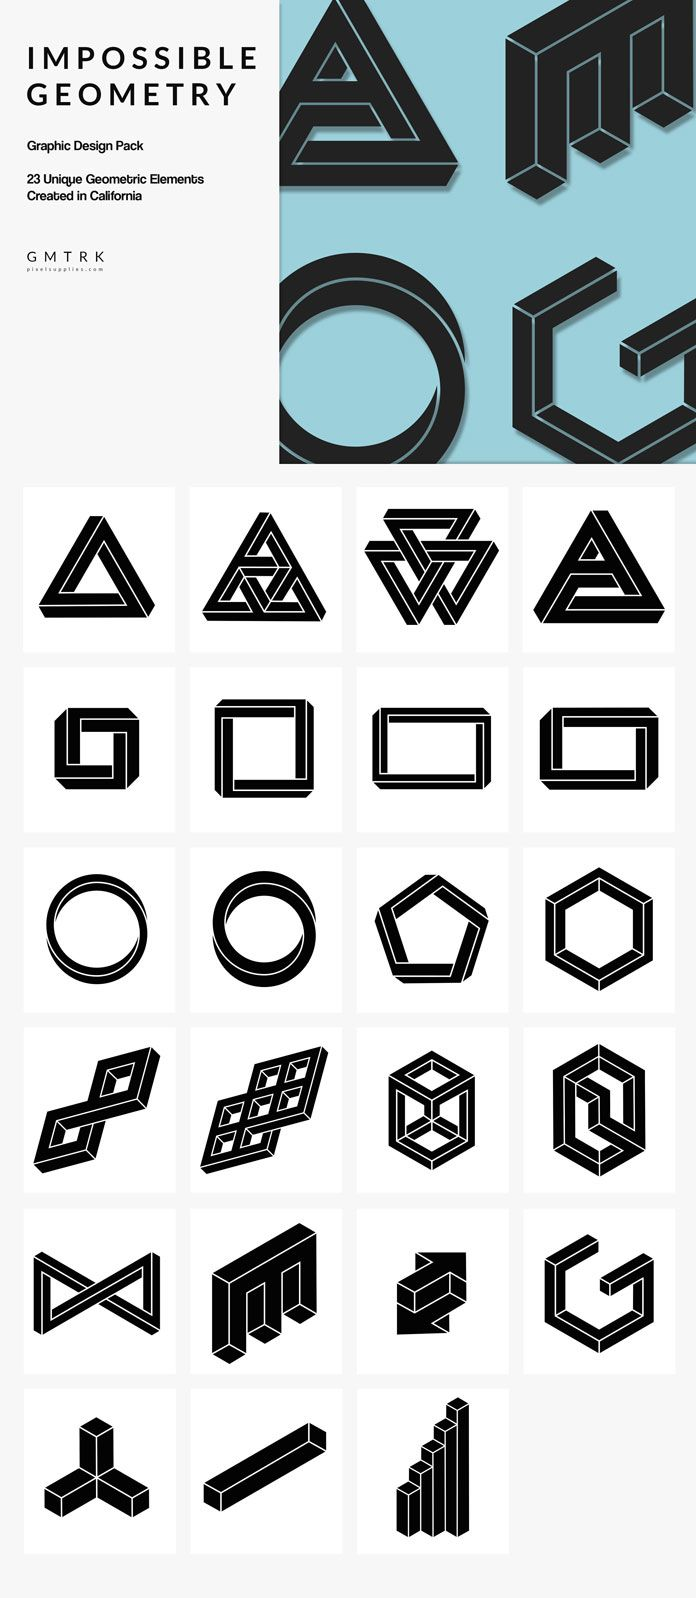 Randy orton tattoos celebritiestattooed com - Impossible Geometry 23 Surreal Geometric Object